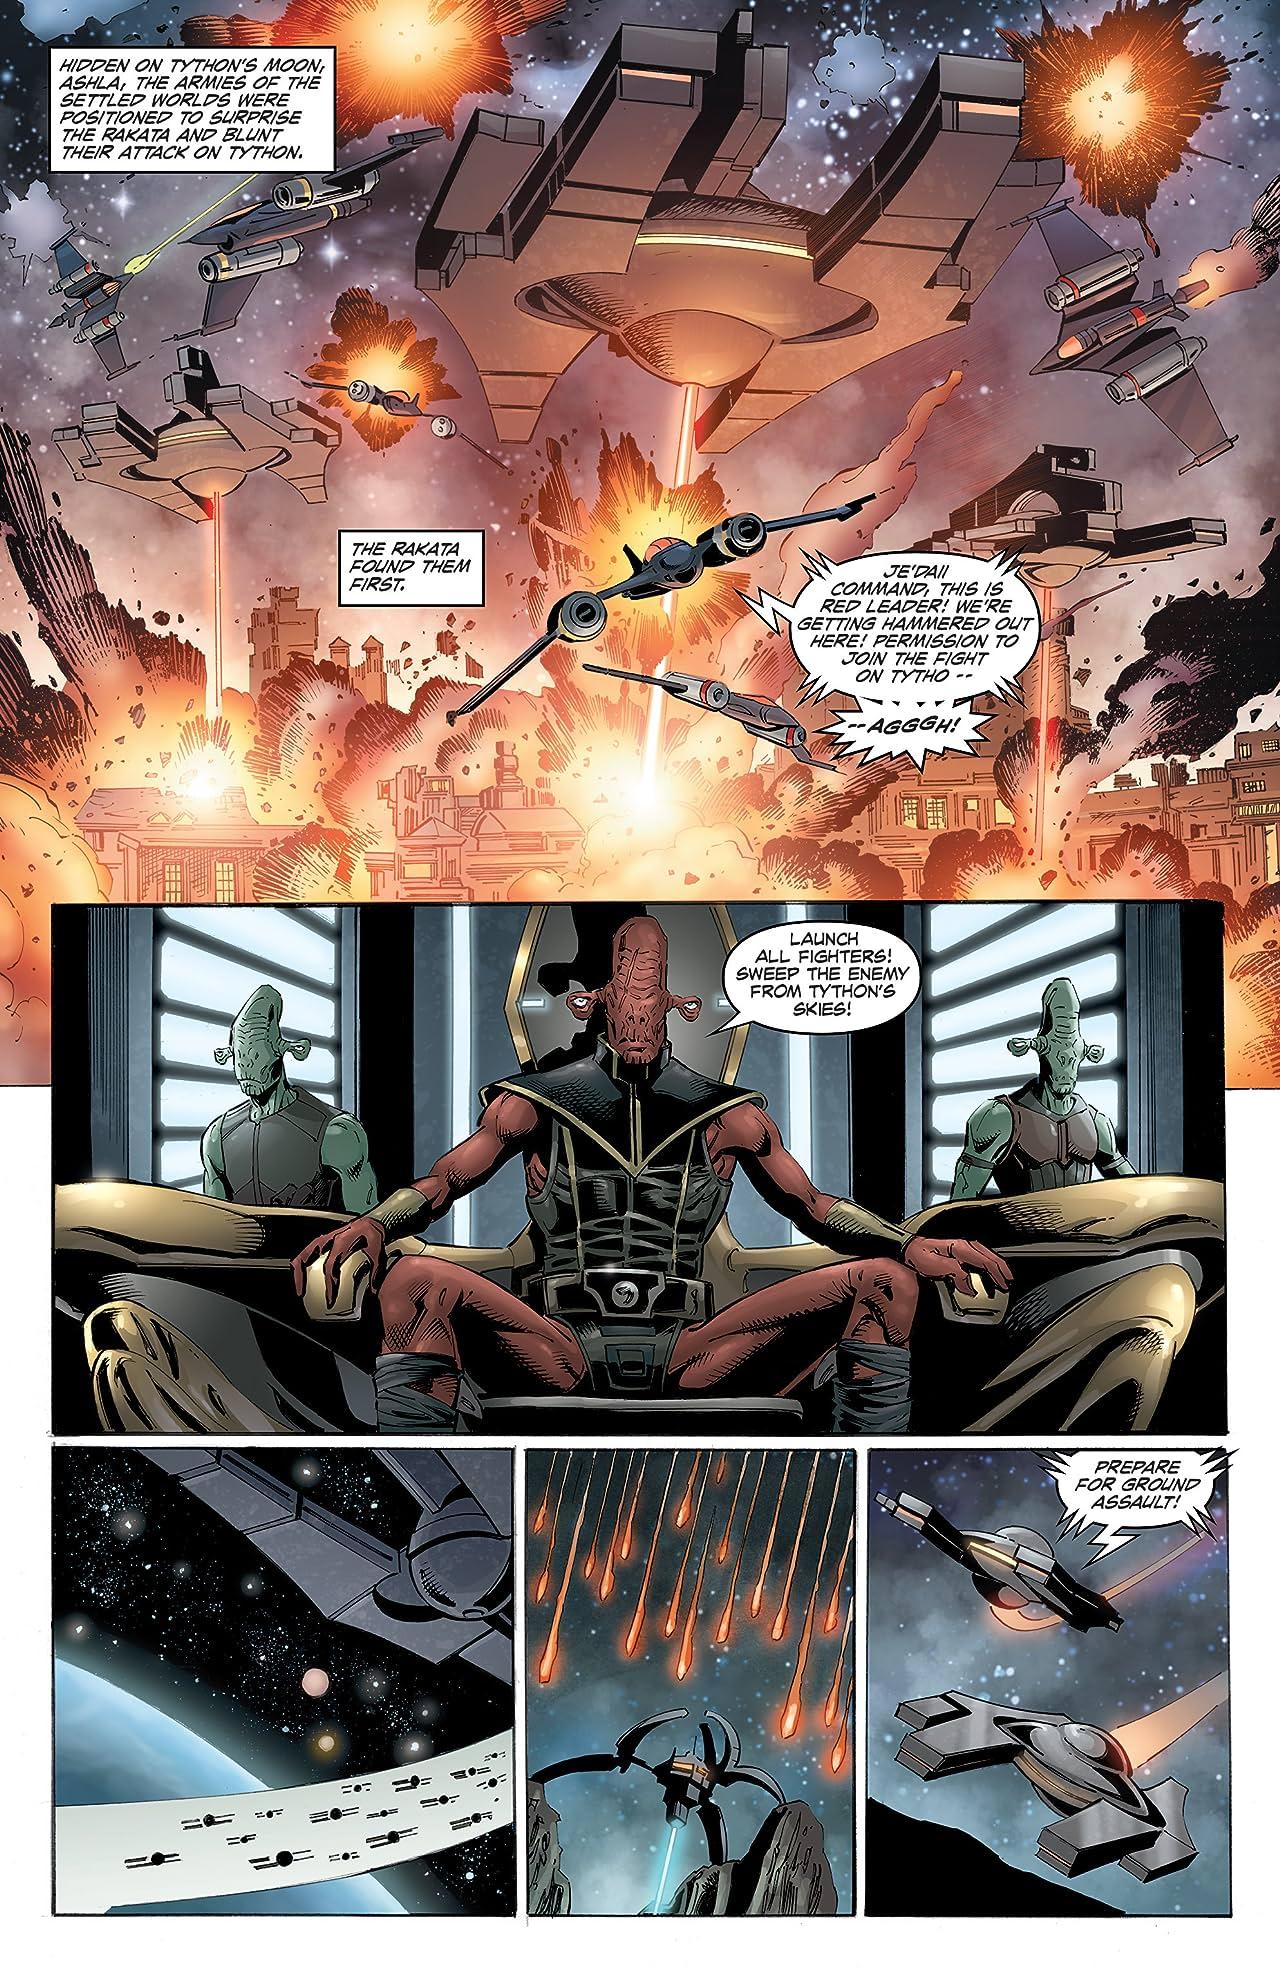 Star Wars: Dawn of the Jedi - Force War (2013-2014) #4 (of 5)